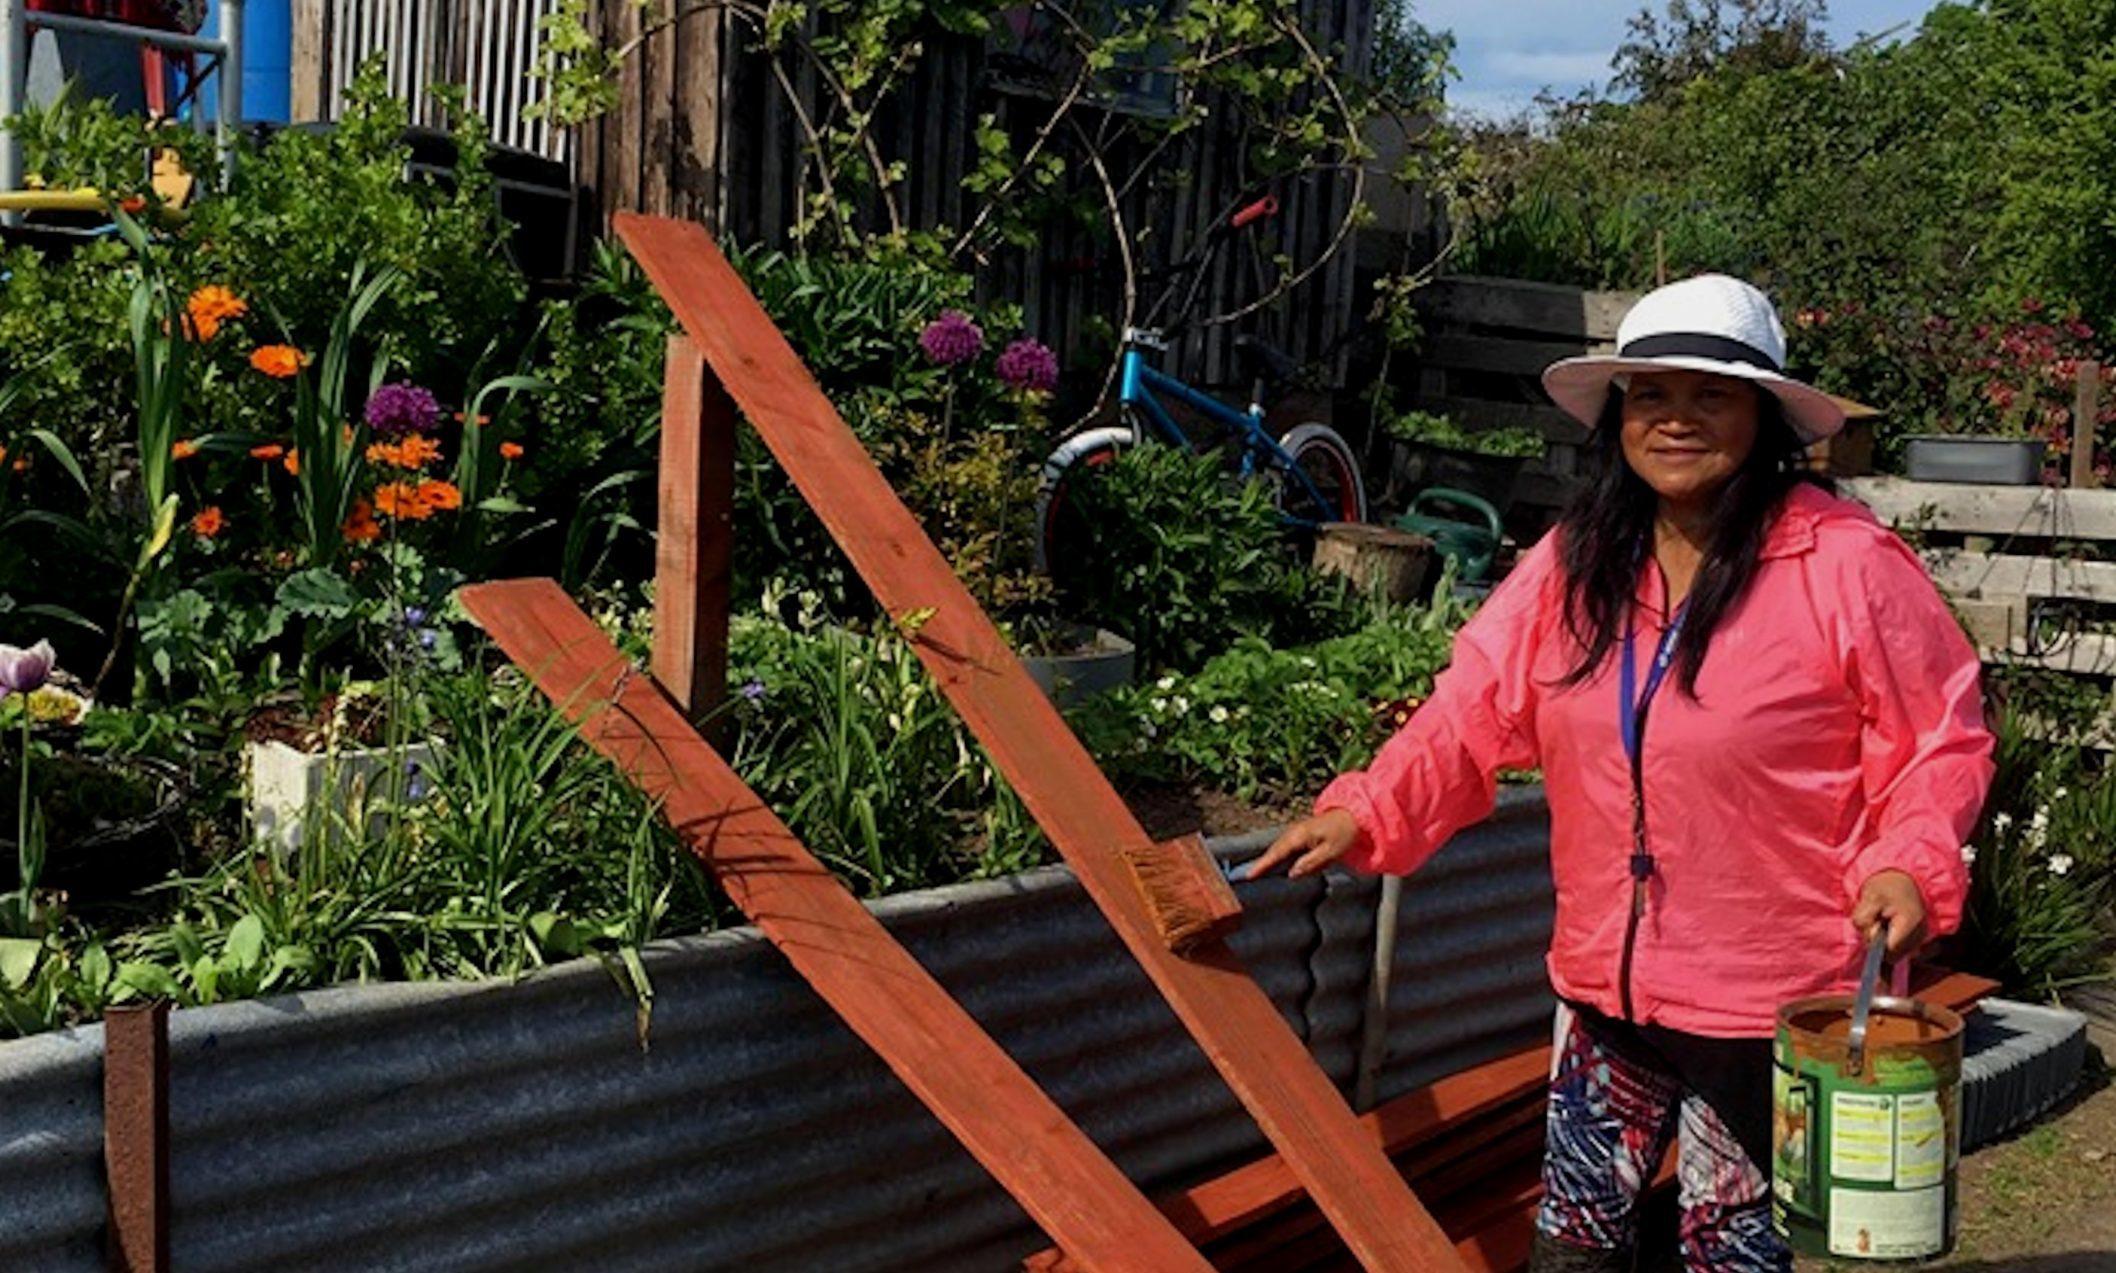 Auralia paints the new fence before erecting it